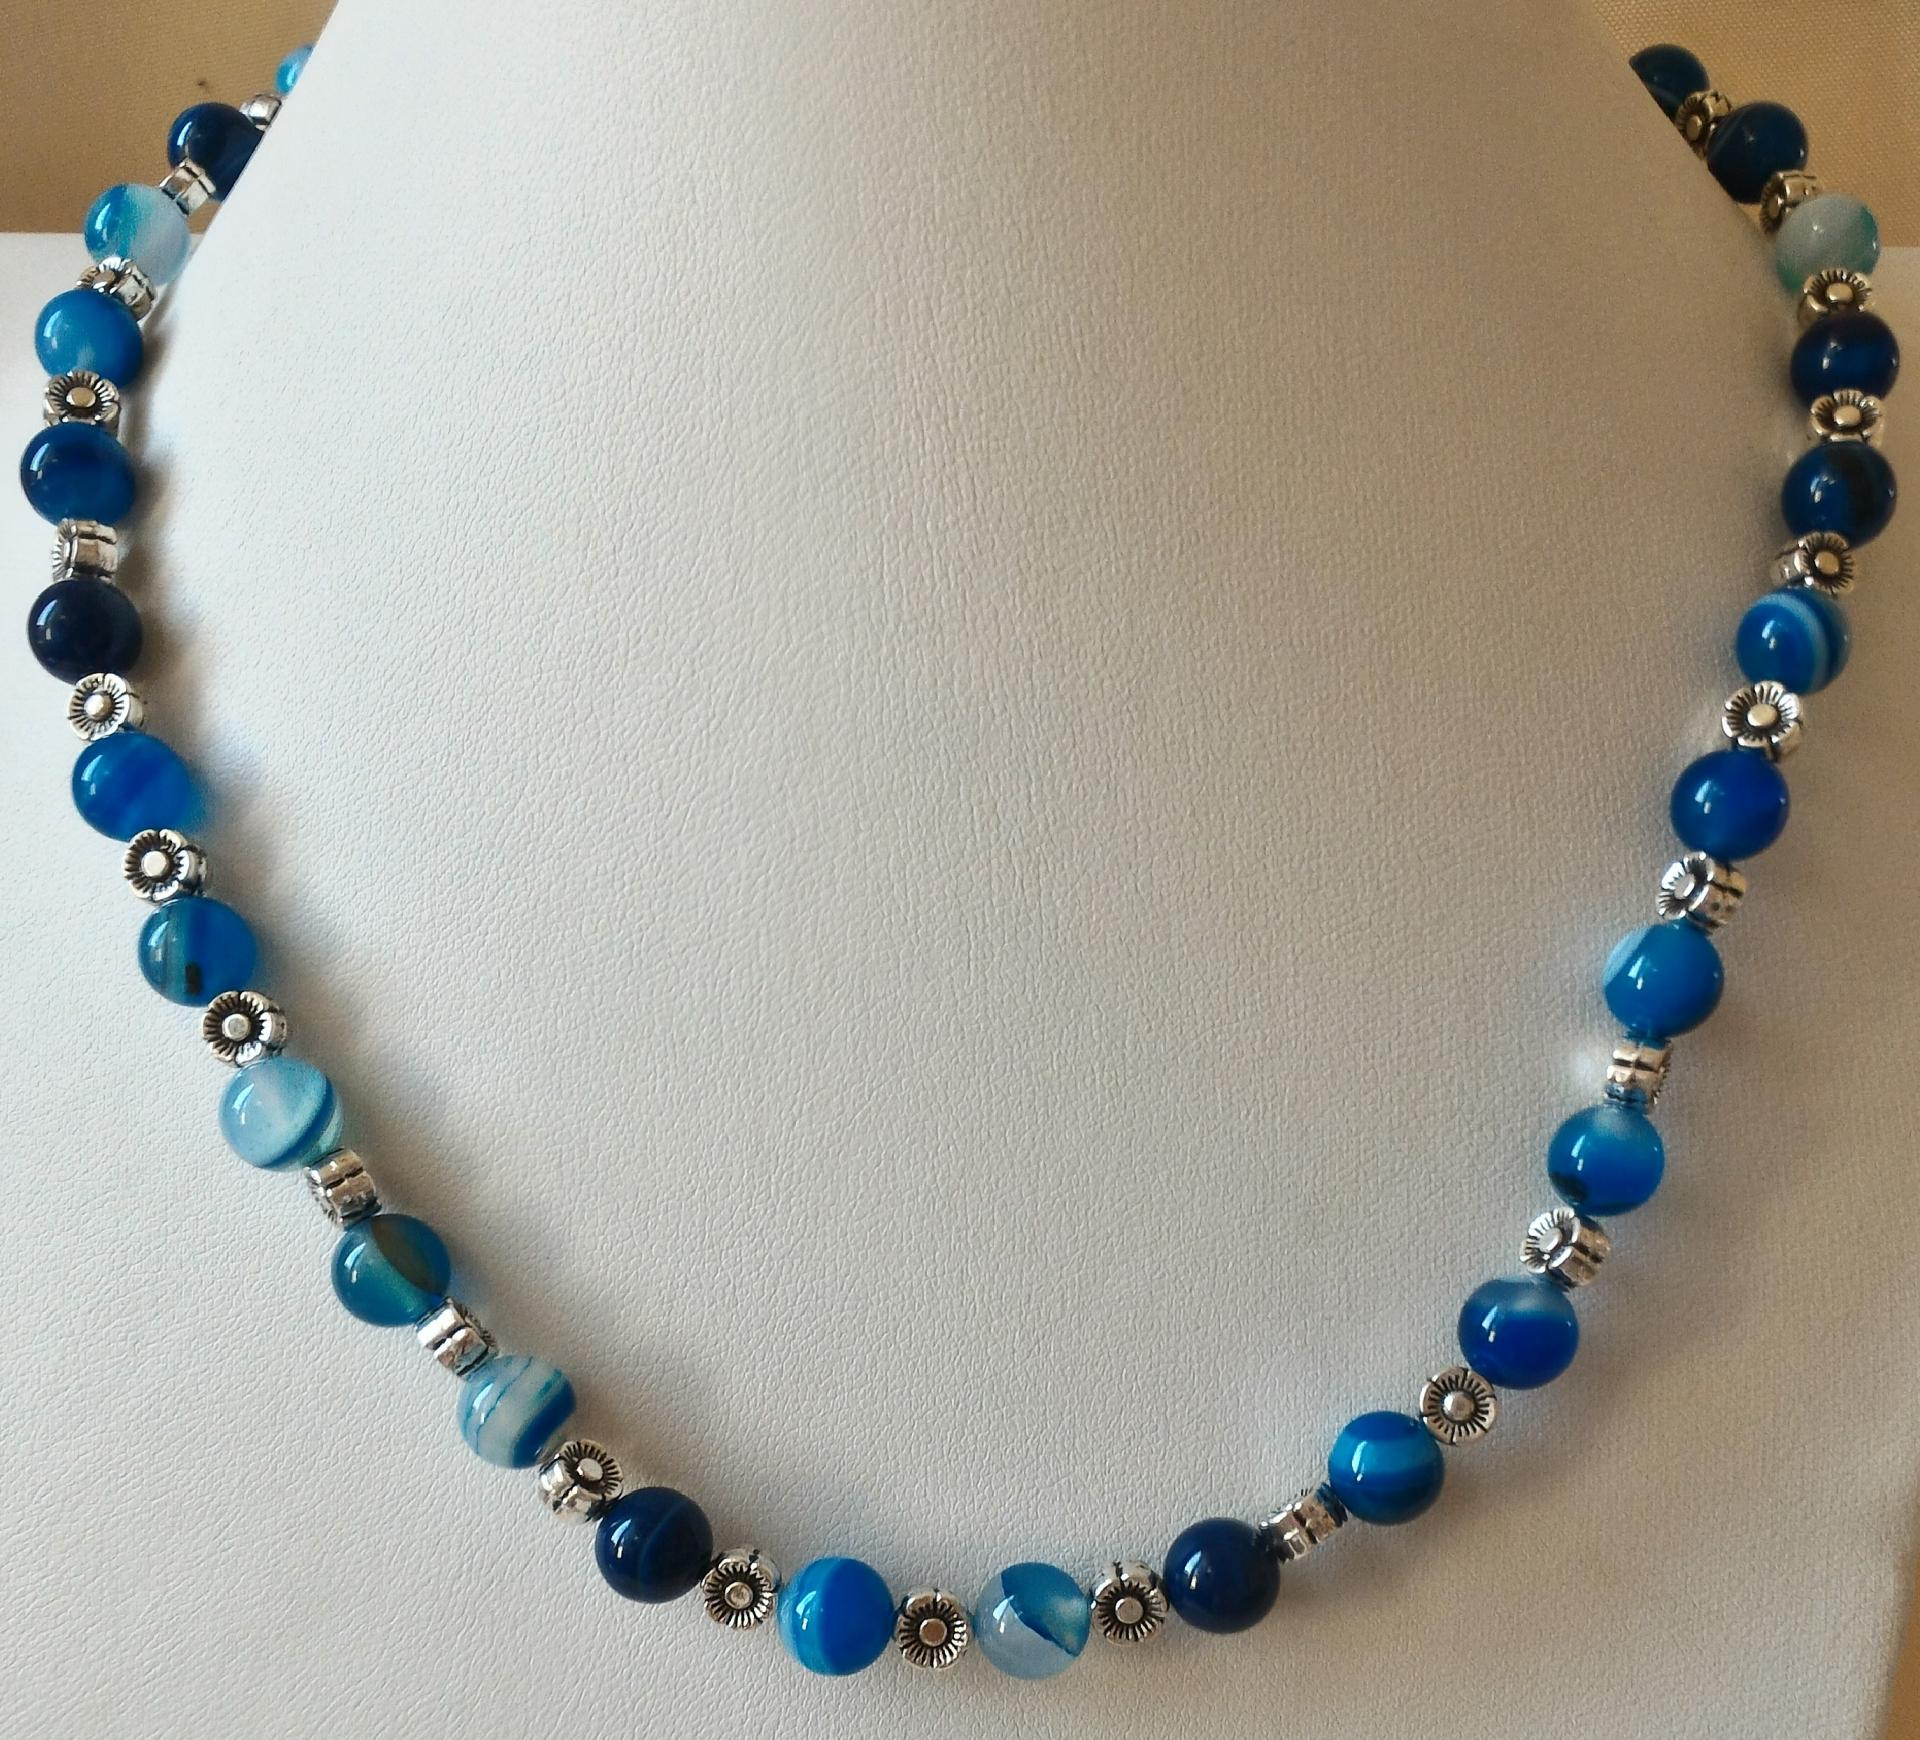 Collier agate bleue 1